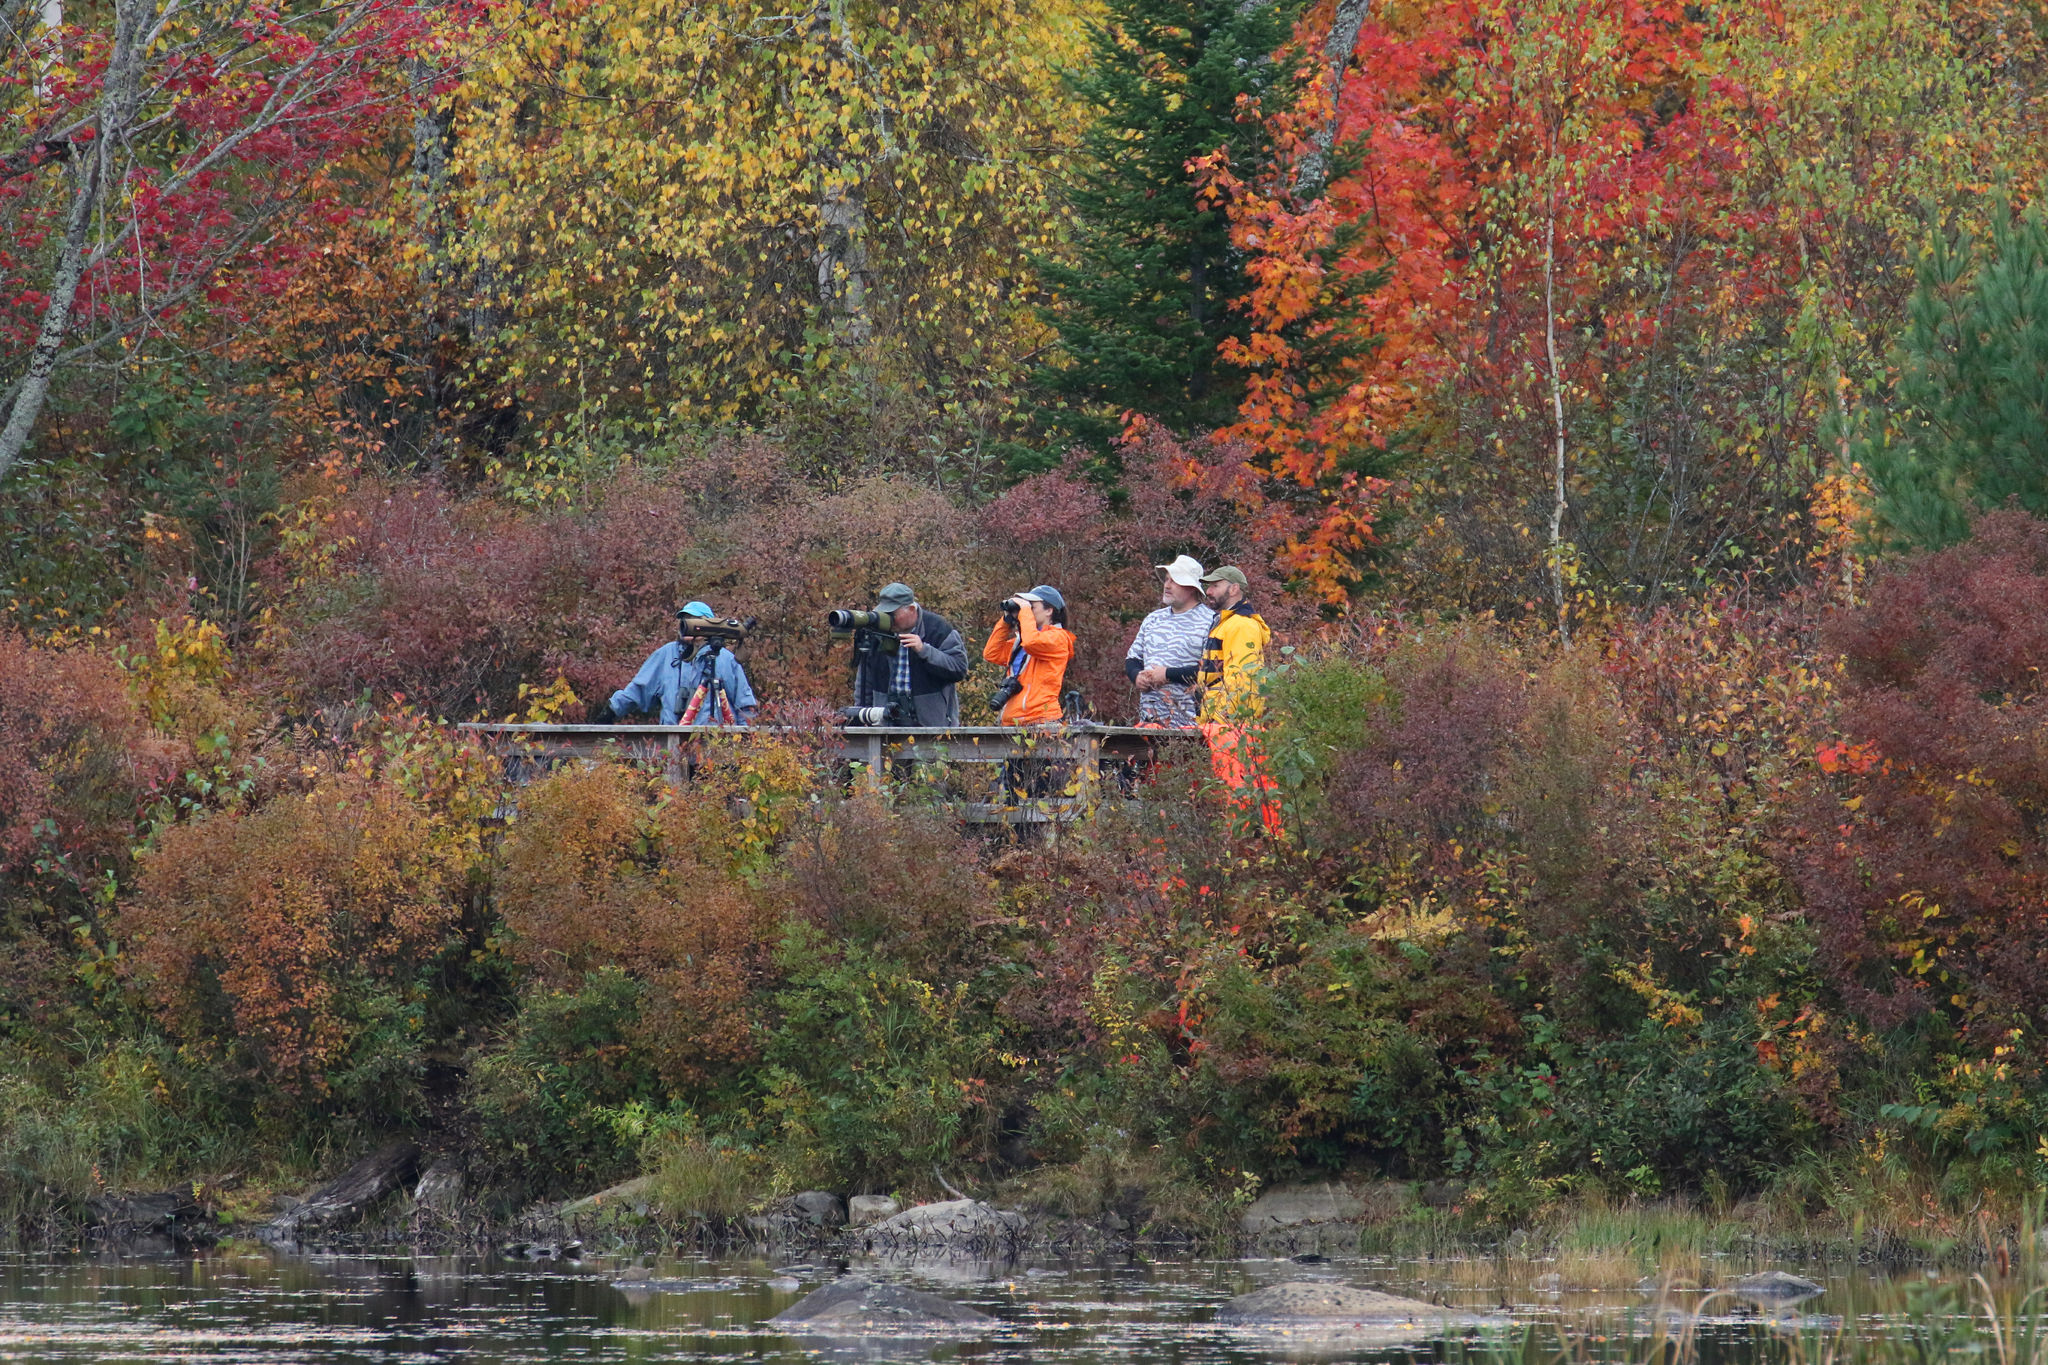 Cherry Pond viewing platform